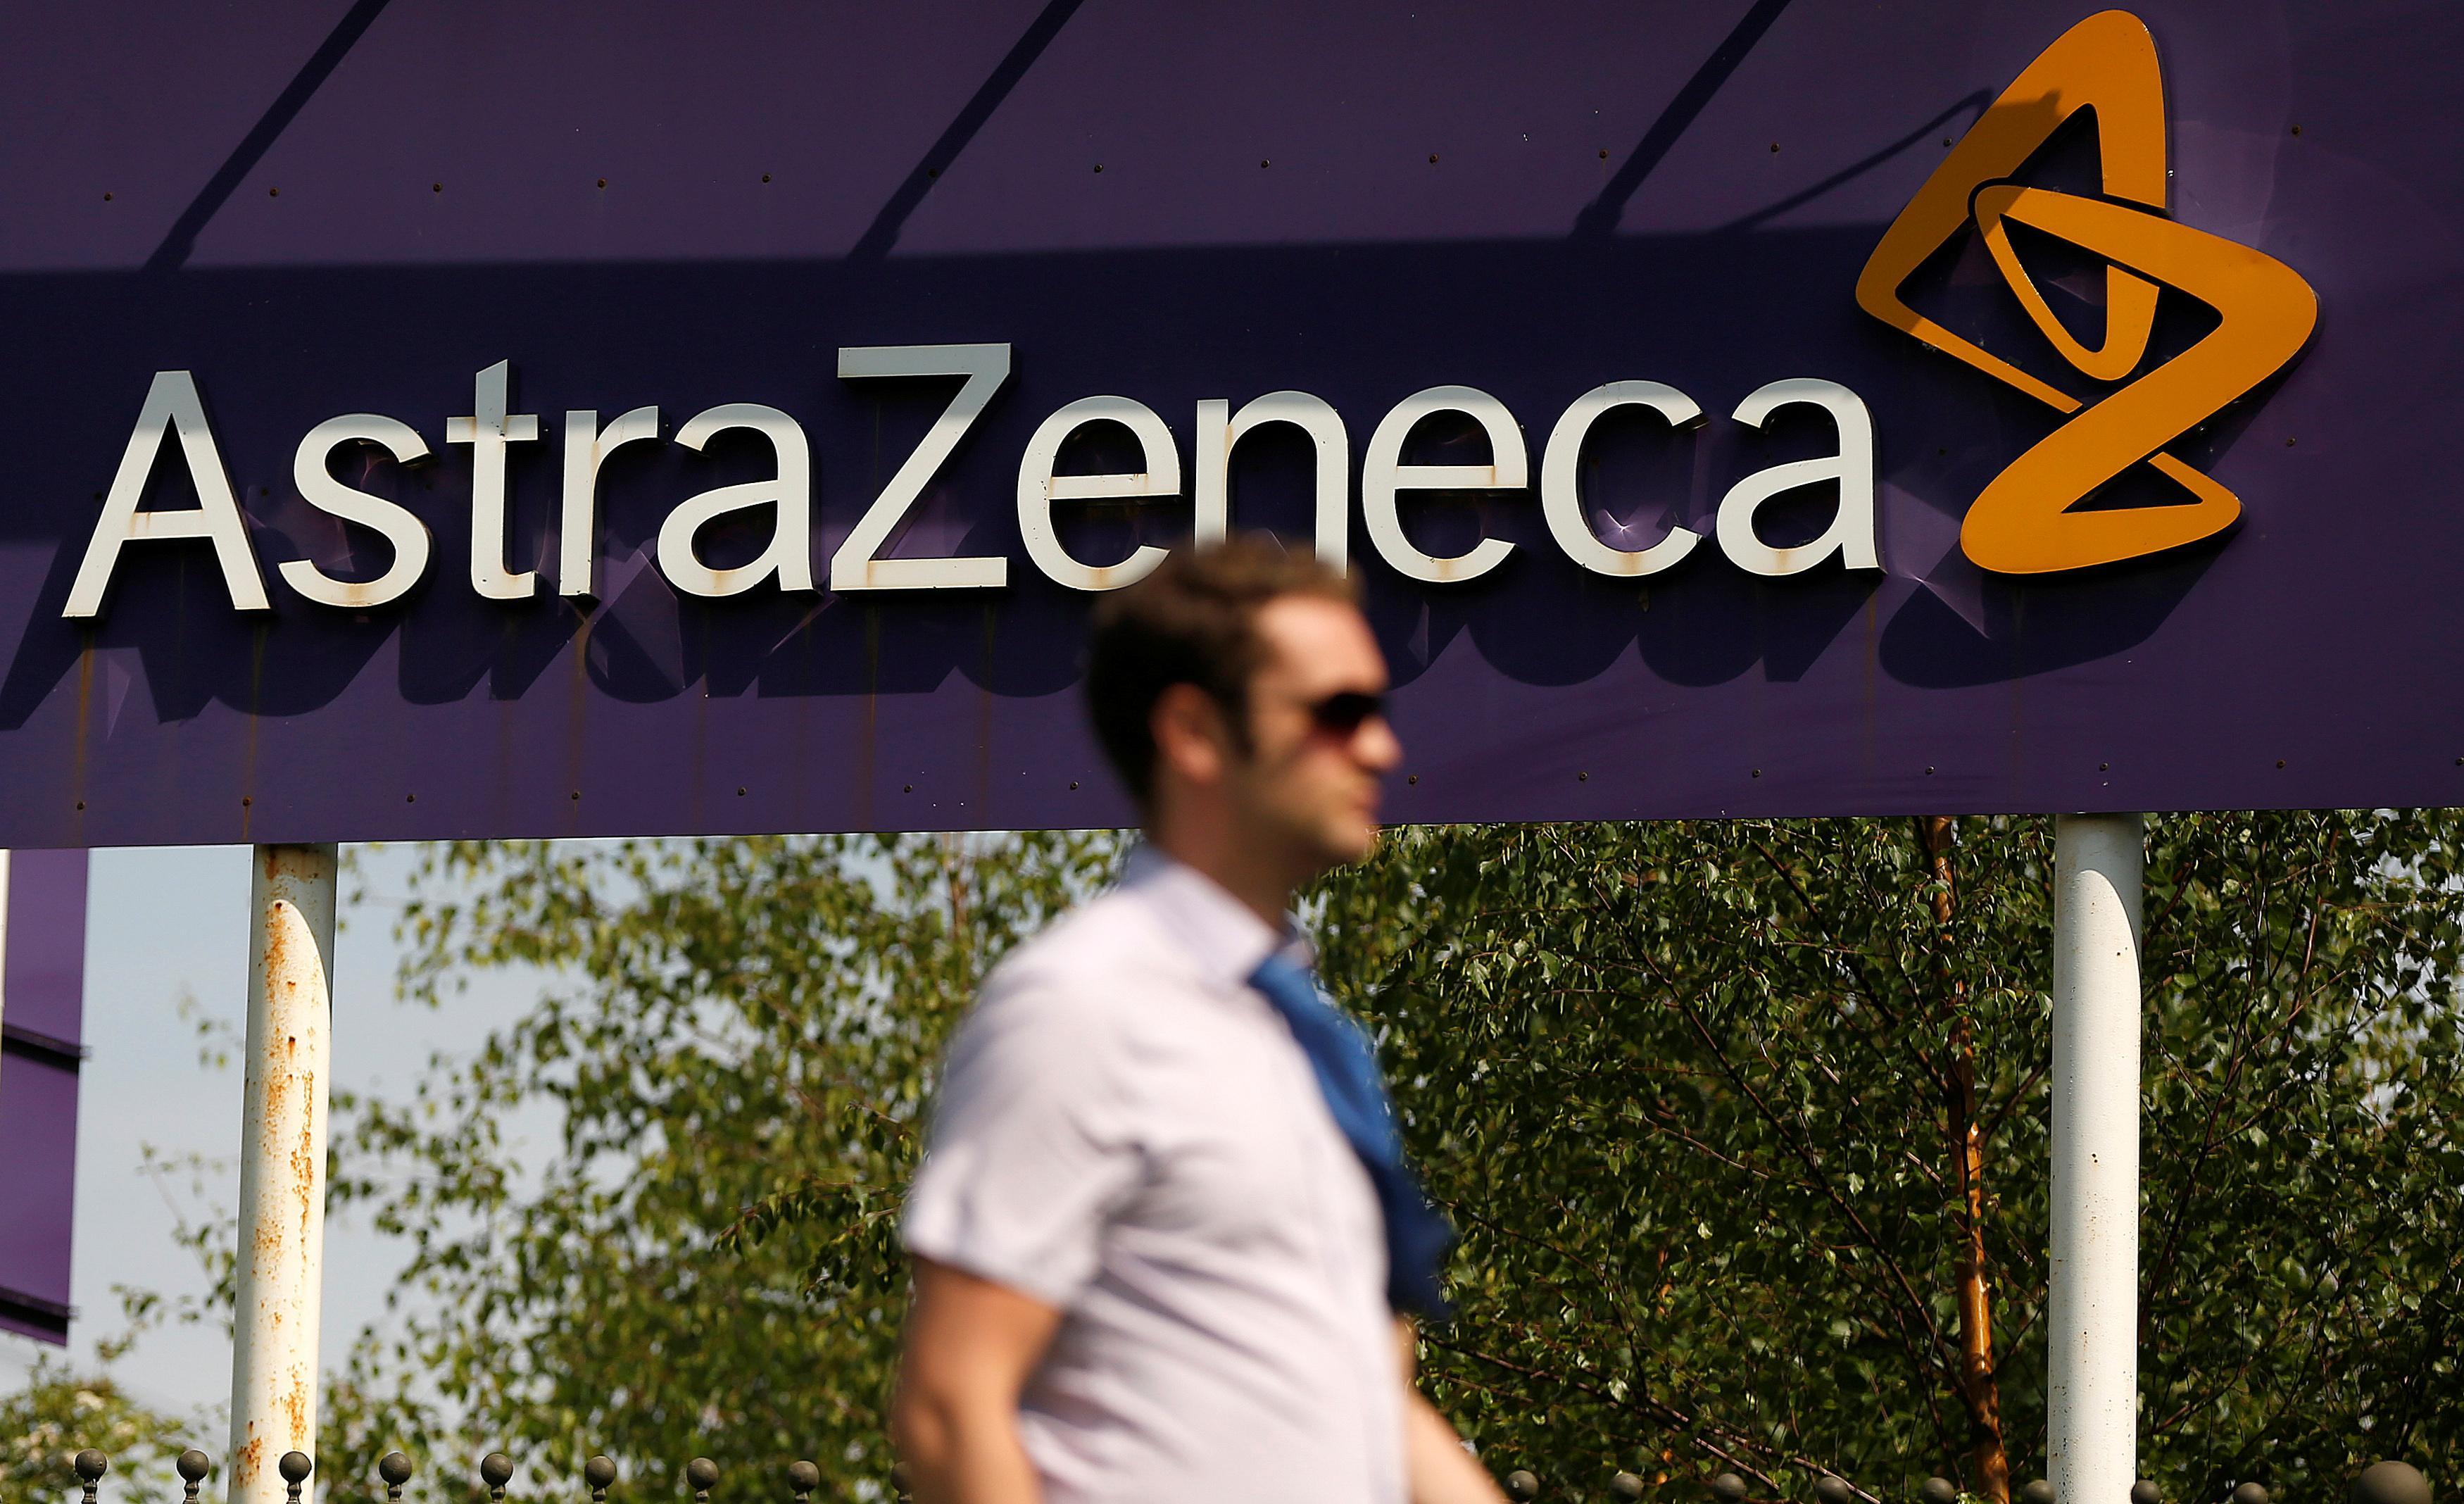 AstraZeneca searches for successor to Chairman Johansson: Sky News